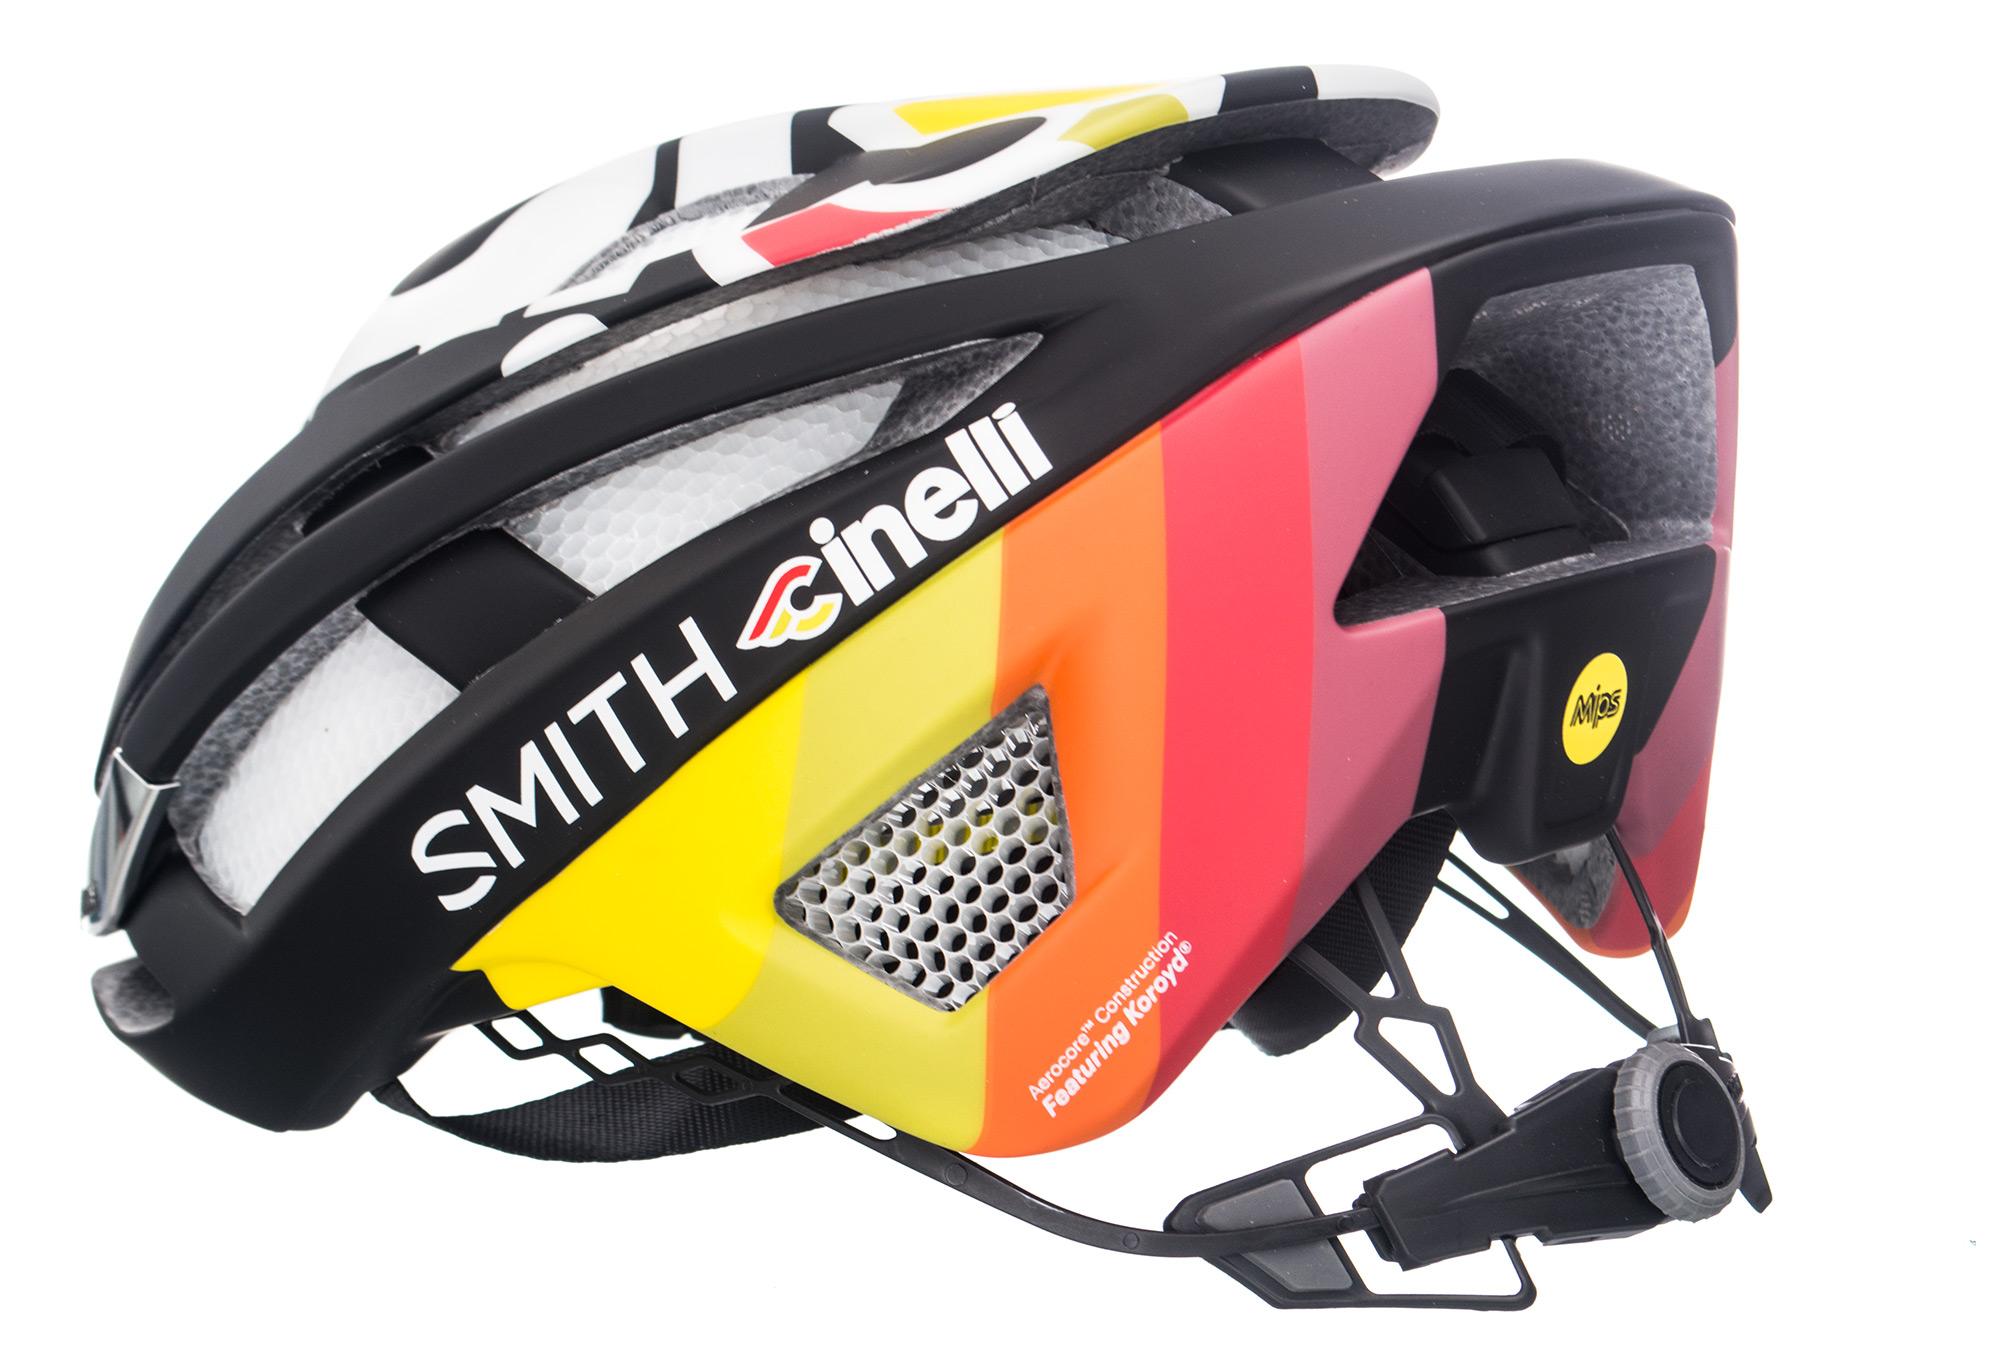 official shop lowest price nice shoes SMITH Overtake MIPS Helmet Black Cinelli | Alltricks.com